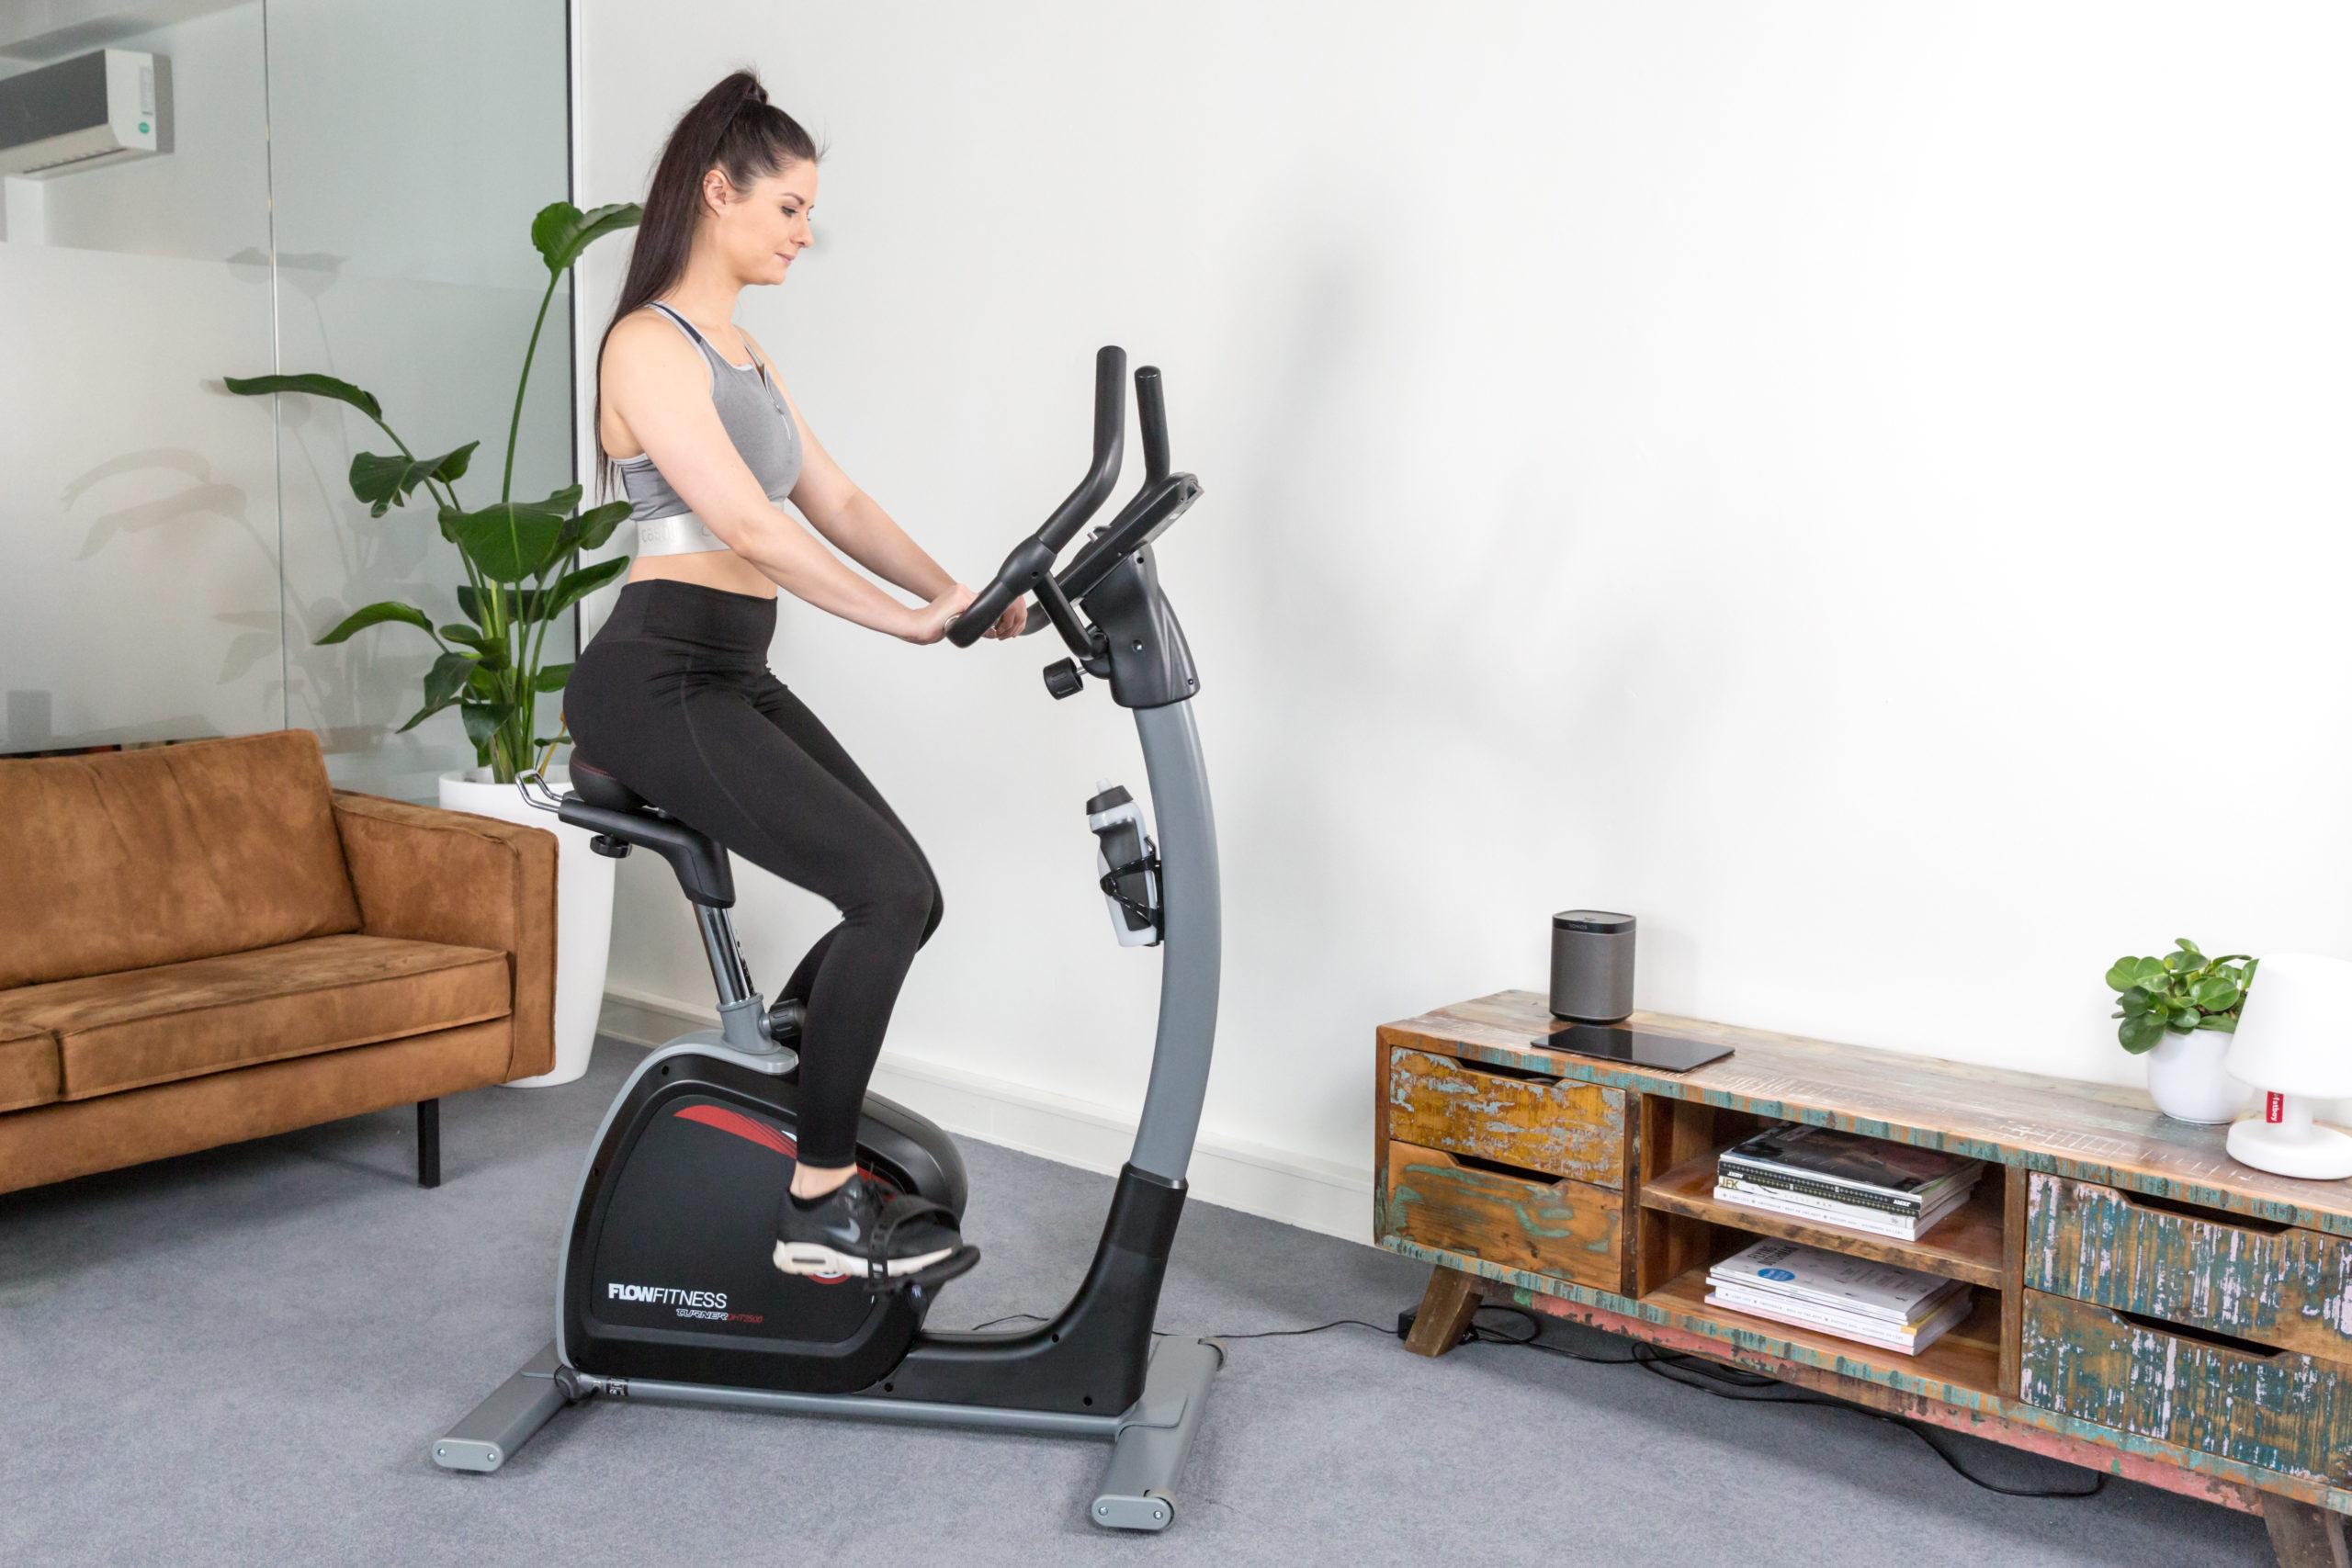 Flow Fitness Tabel Turner DHT2500i Hometrainer 15